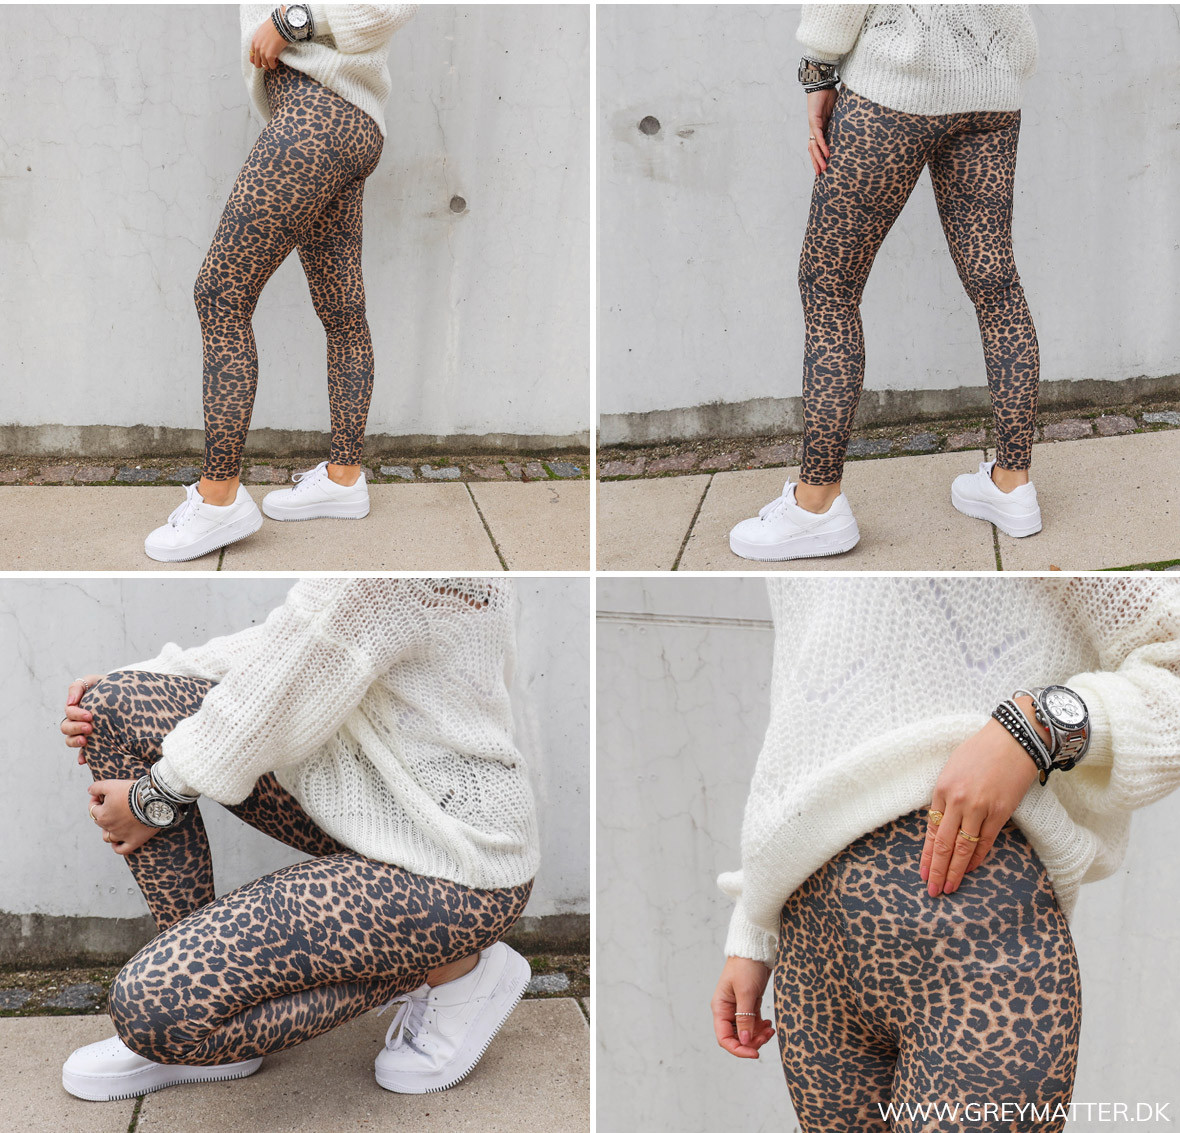 greymatter_fashion_leggings.jpg